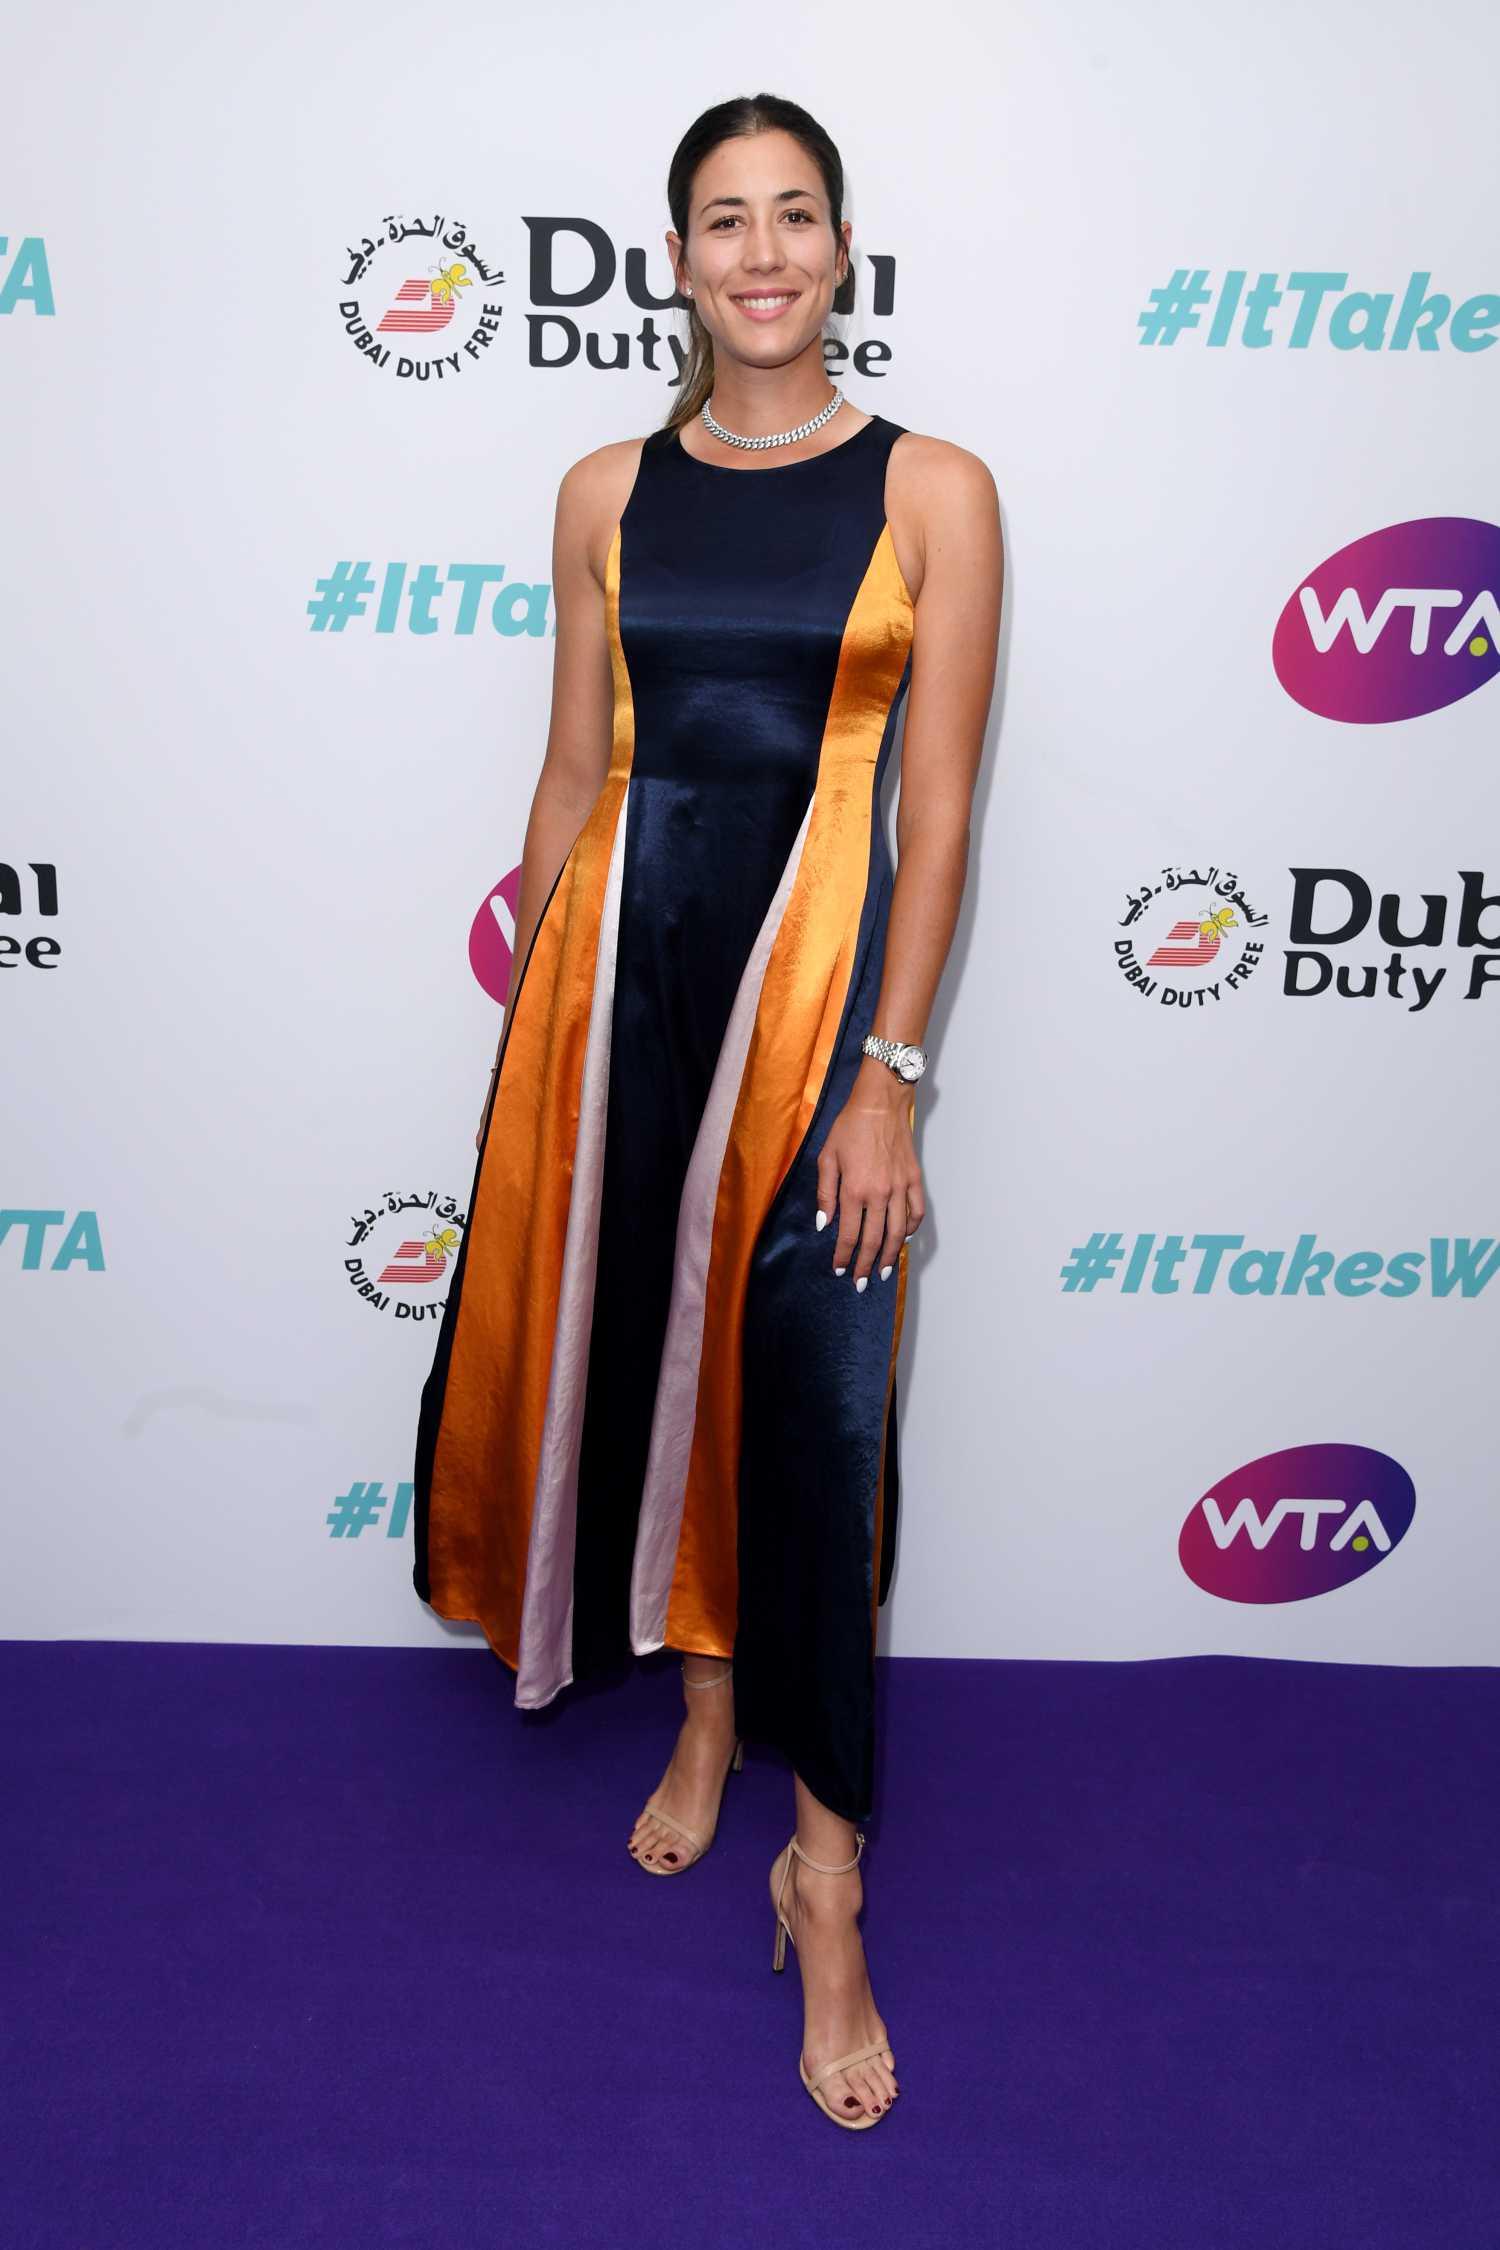 Garbine Muguruza Attends Dubai Duty Free WTA Summer Party in London – Celeb Donut